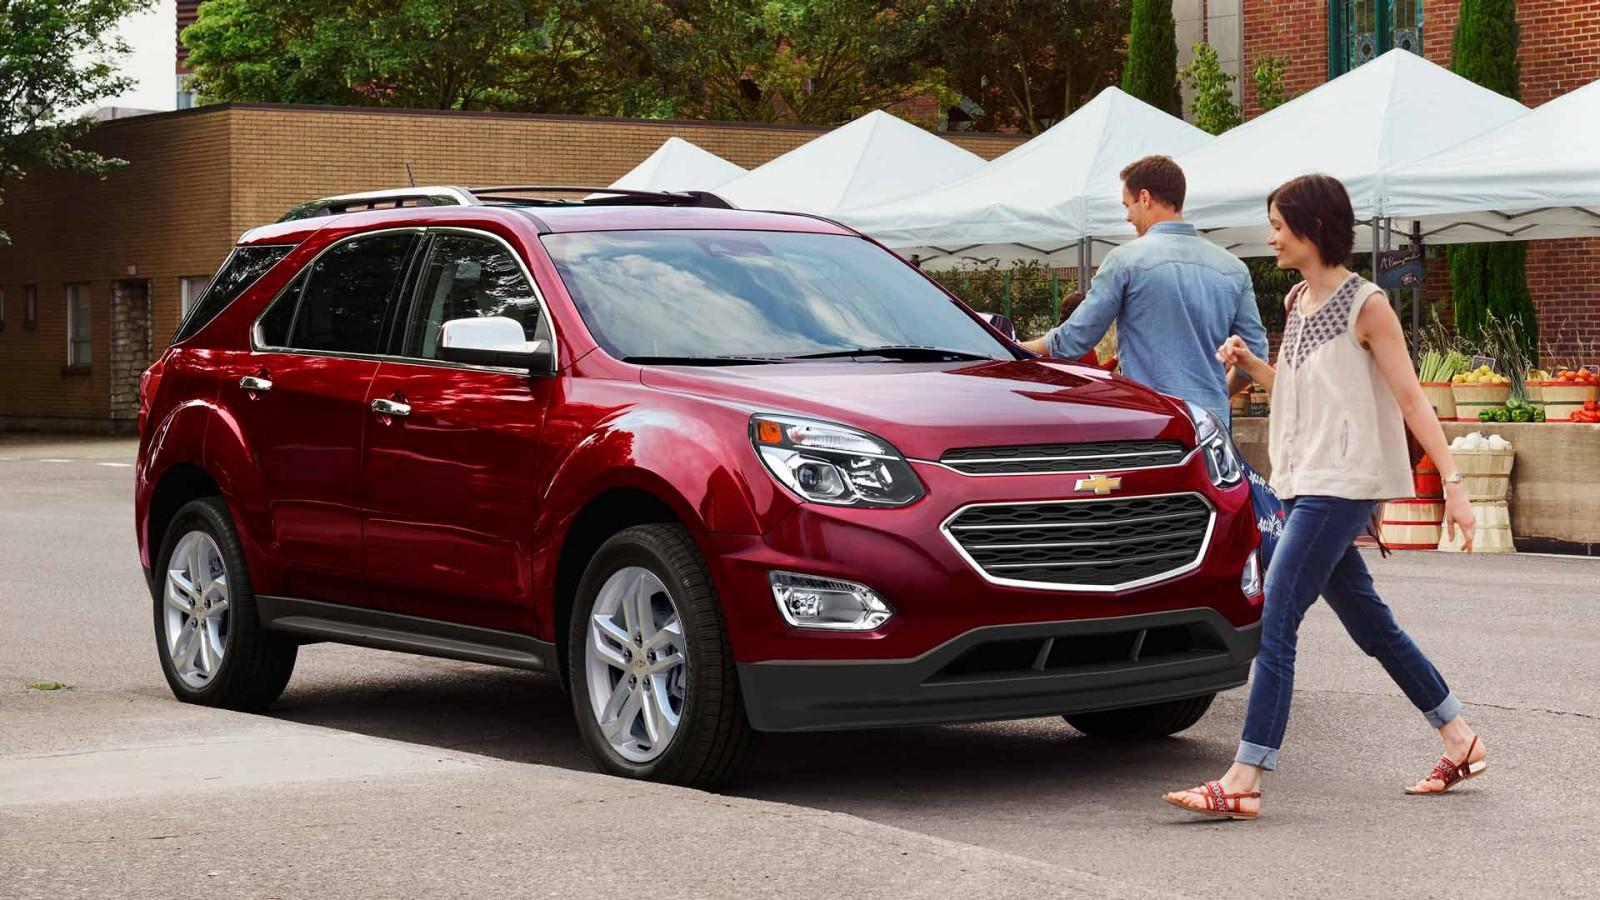 Chevrolet Equinox Lease Deals Price Louisville KY - Chevrolet louisville ky